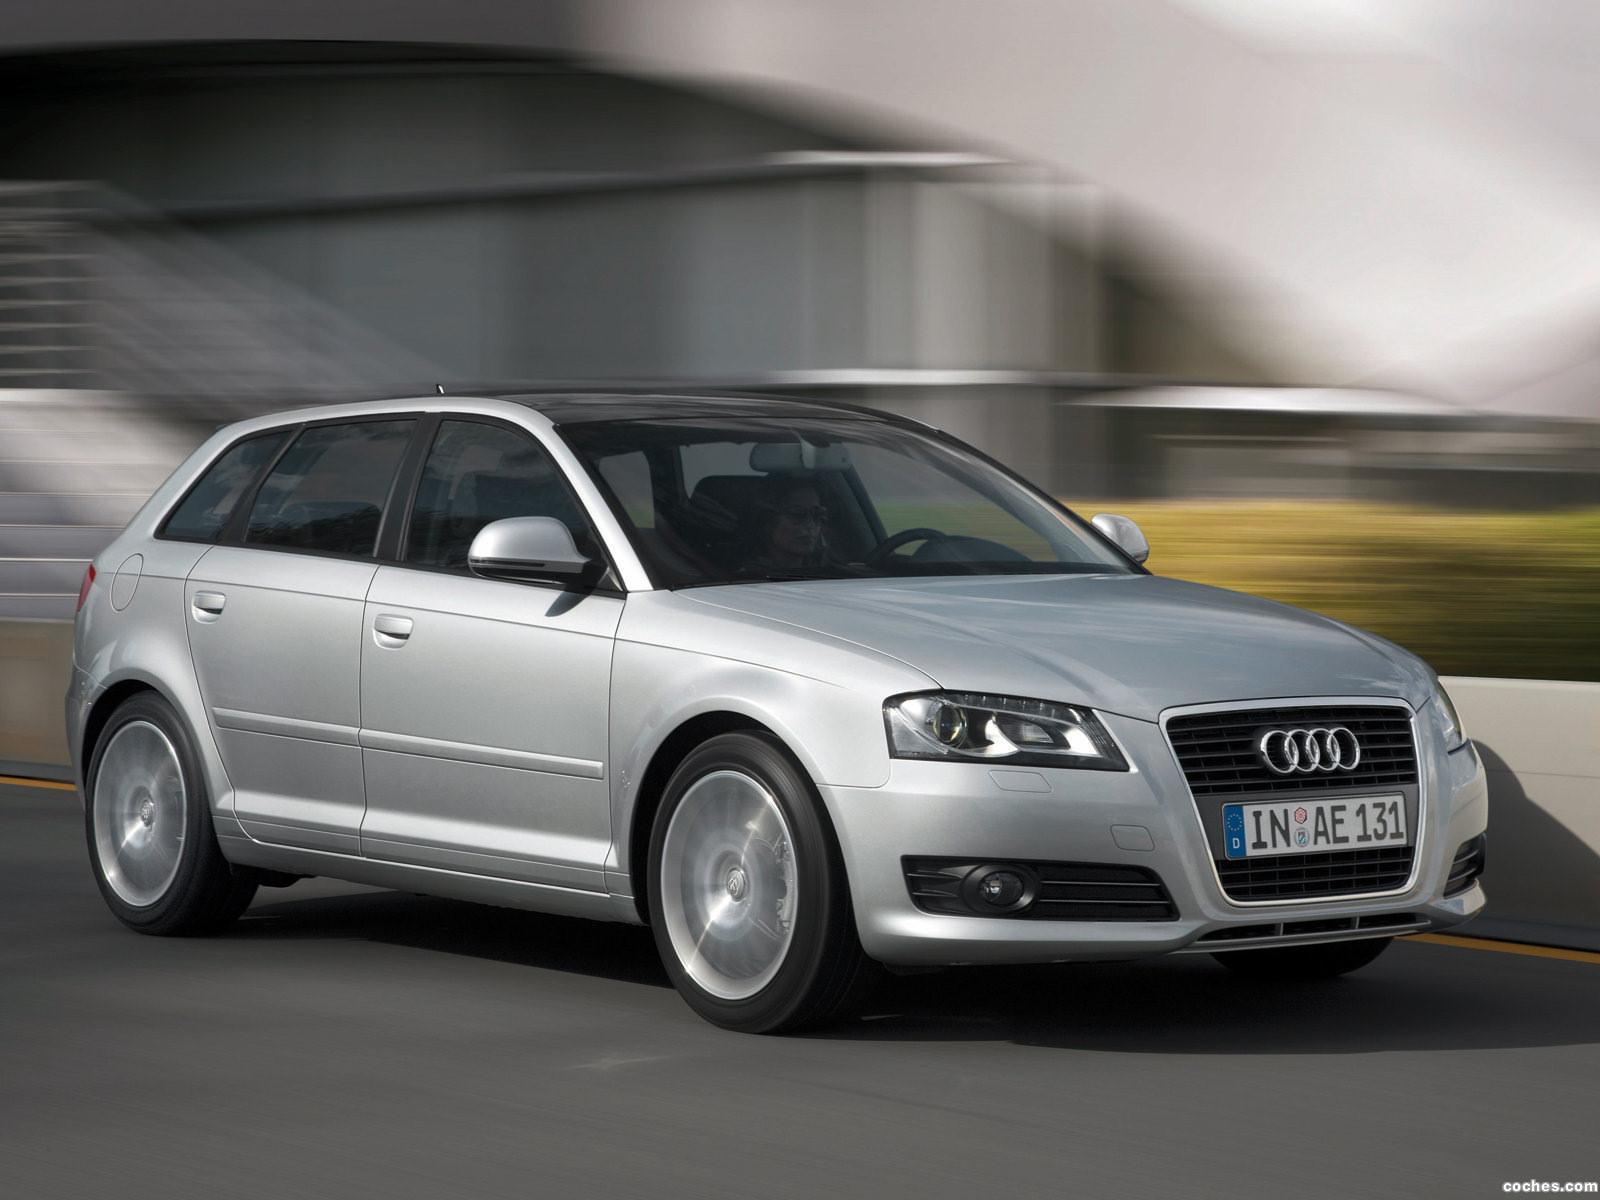 Foto 0 de Audi A3 Sportback Facelift 2008